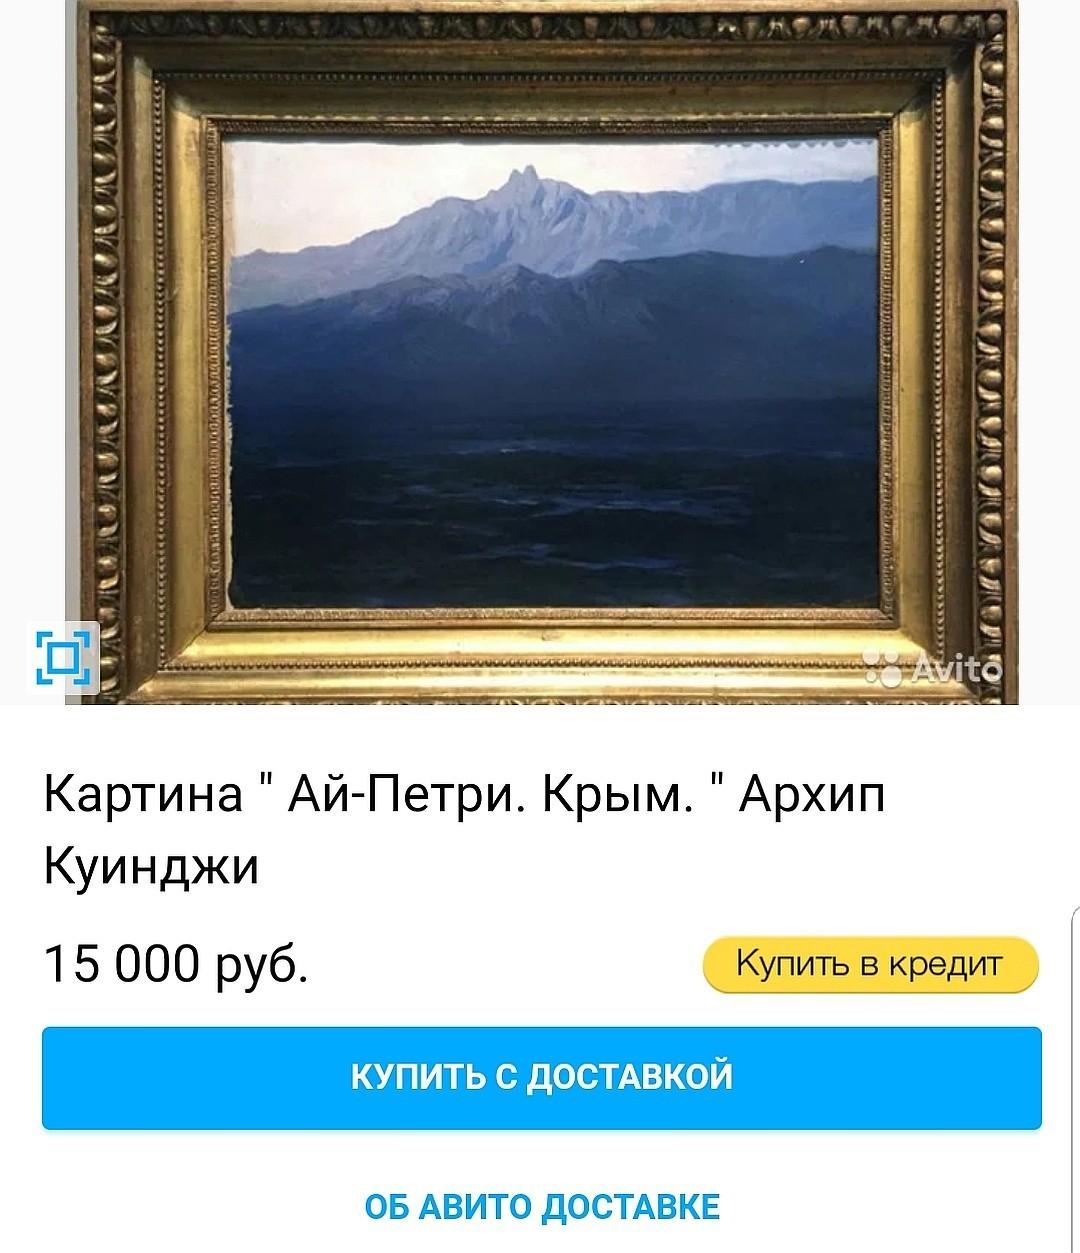 b28722c4b473 Украденную из Третьяковки картину Куинджи продают на Авито